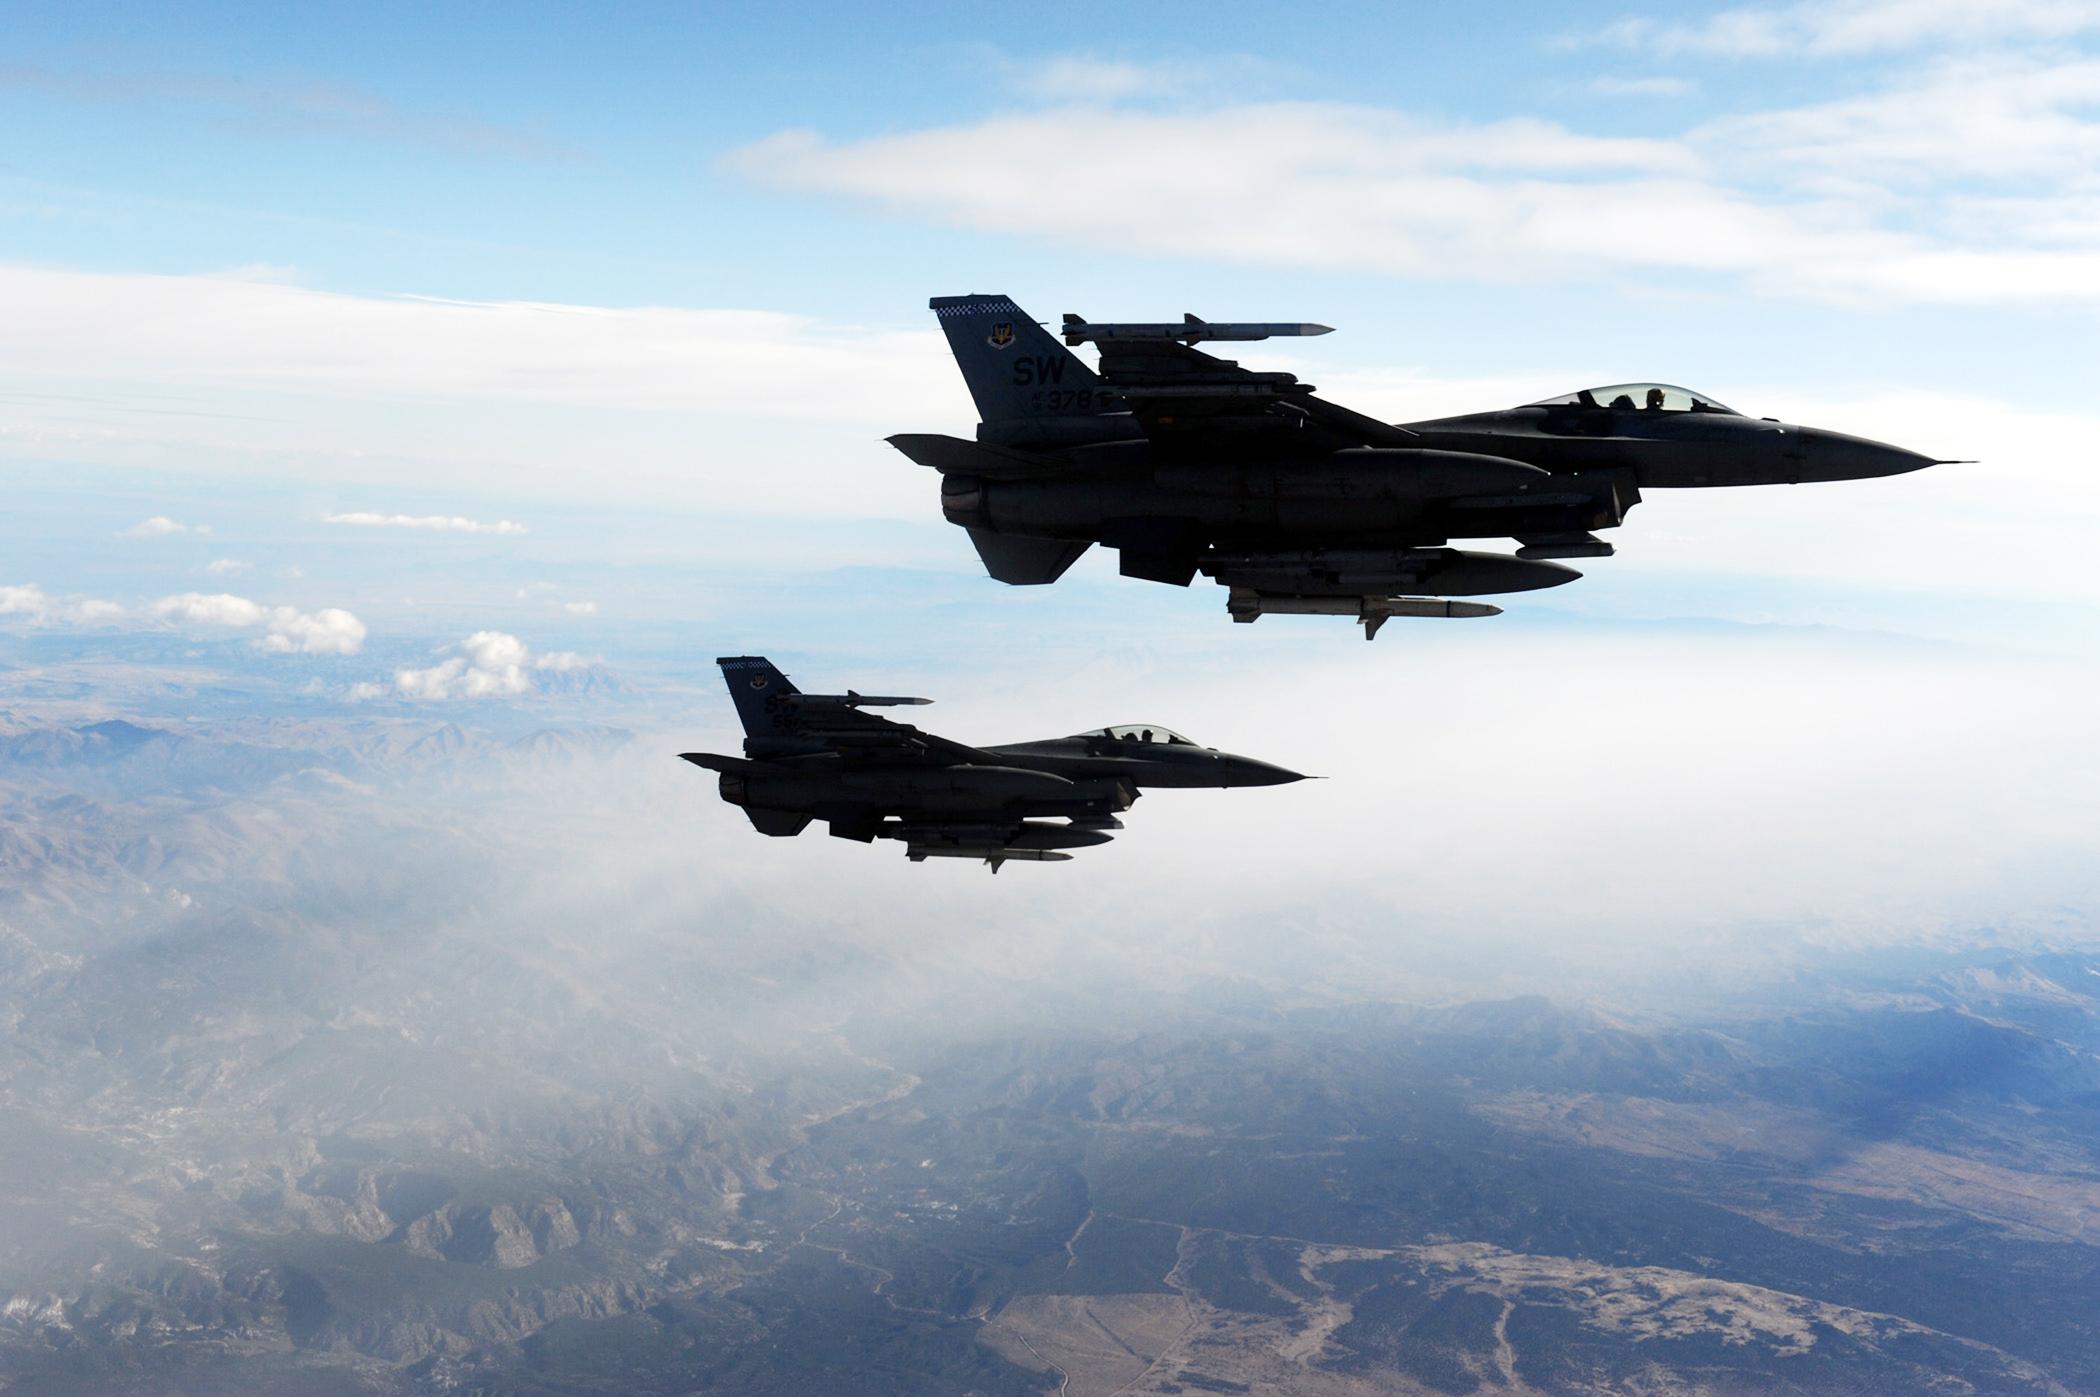 авиация самолет желтый F-16 Fighting Falcon  № 3755641 бесплатно